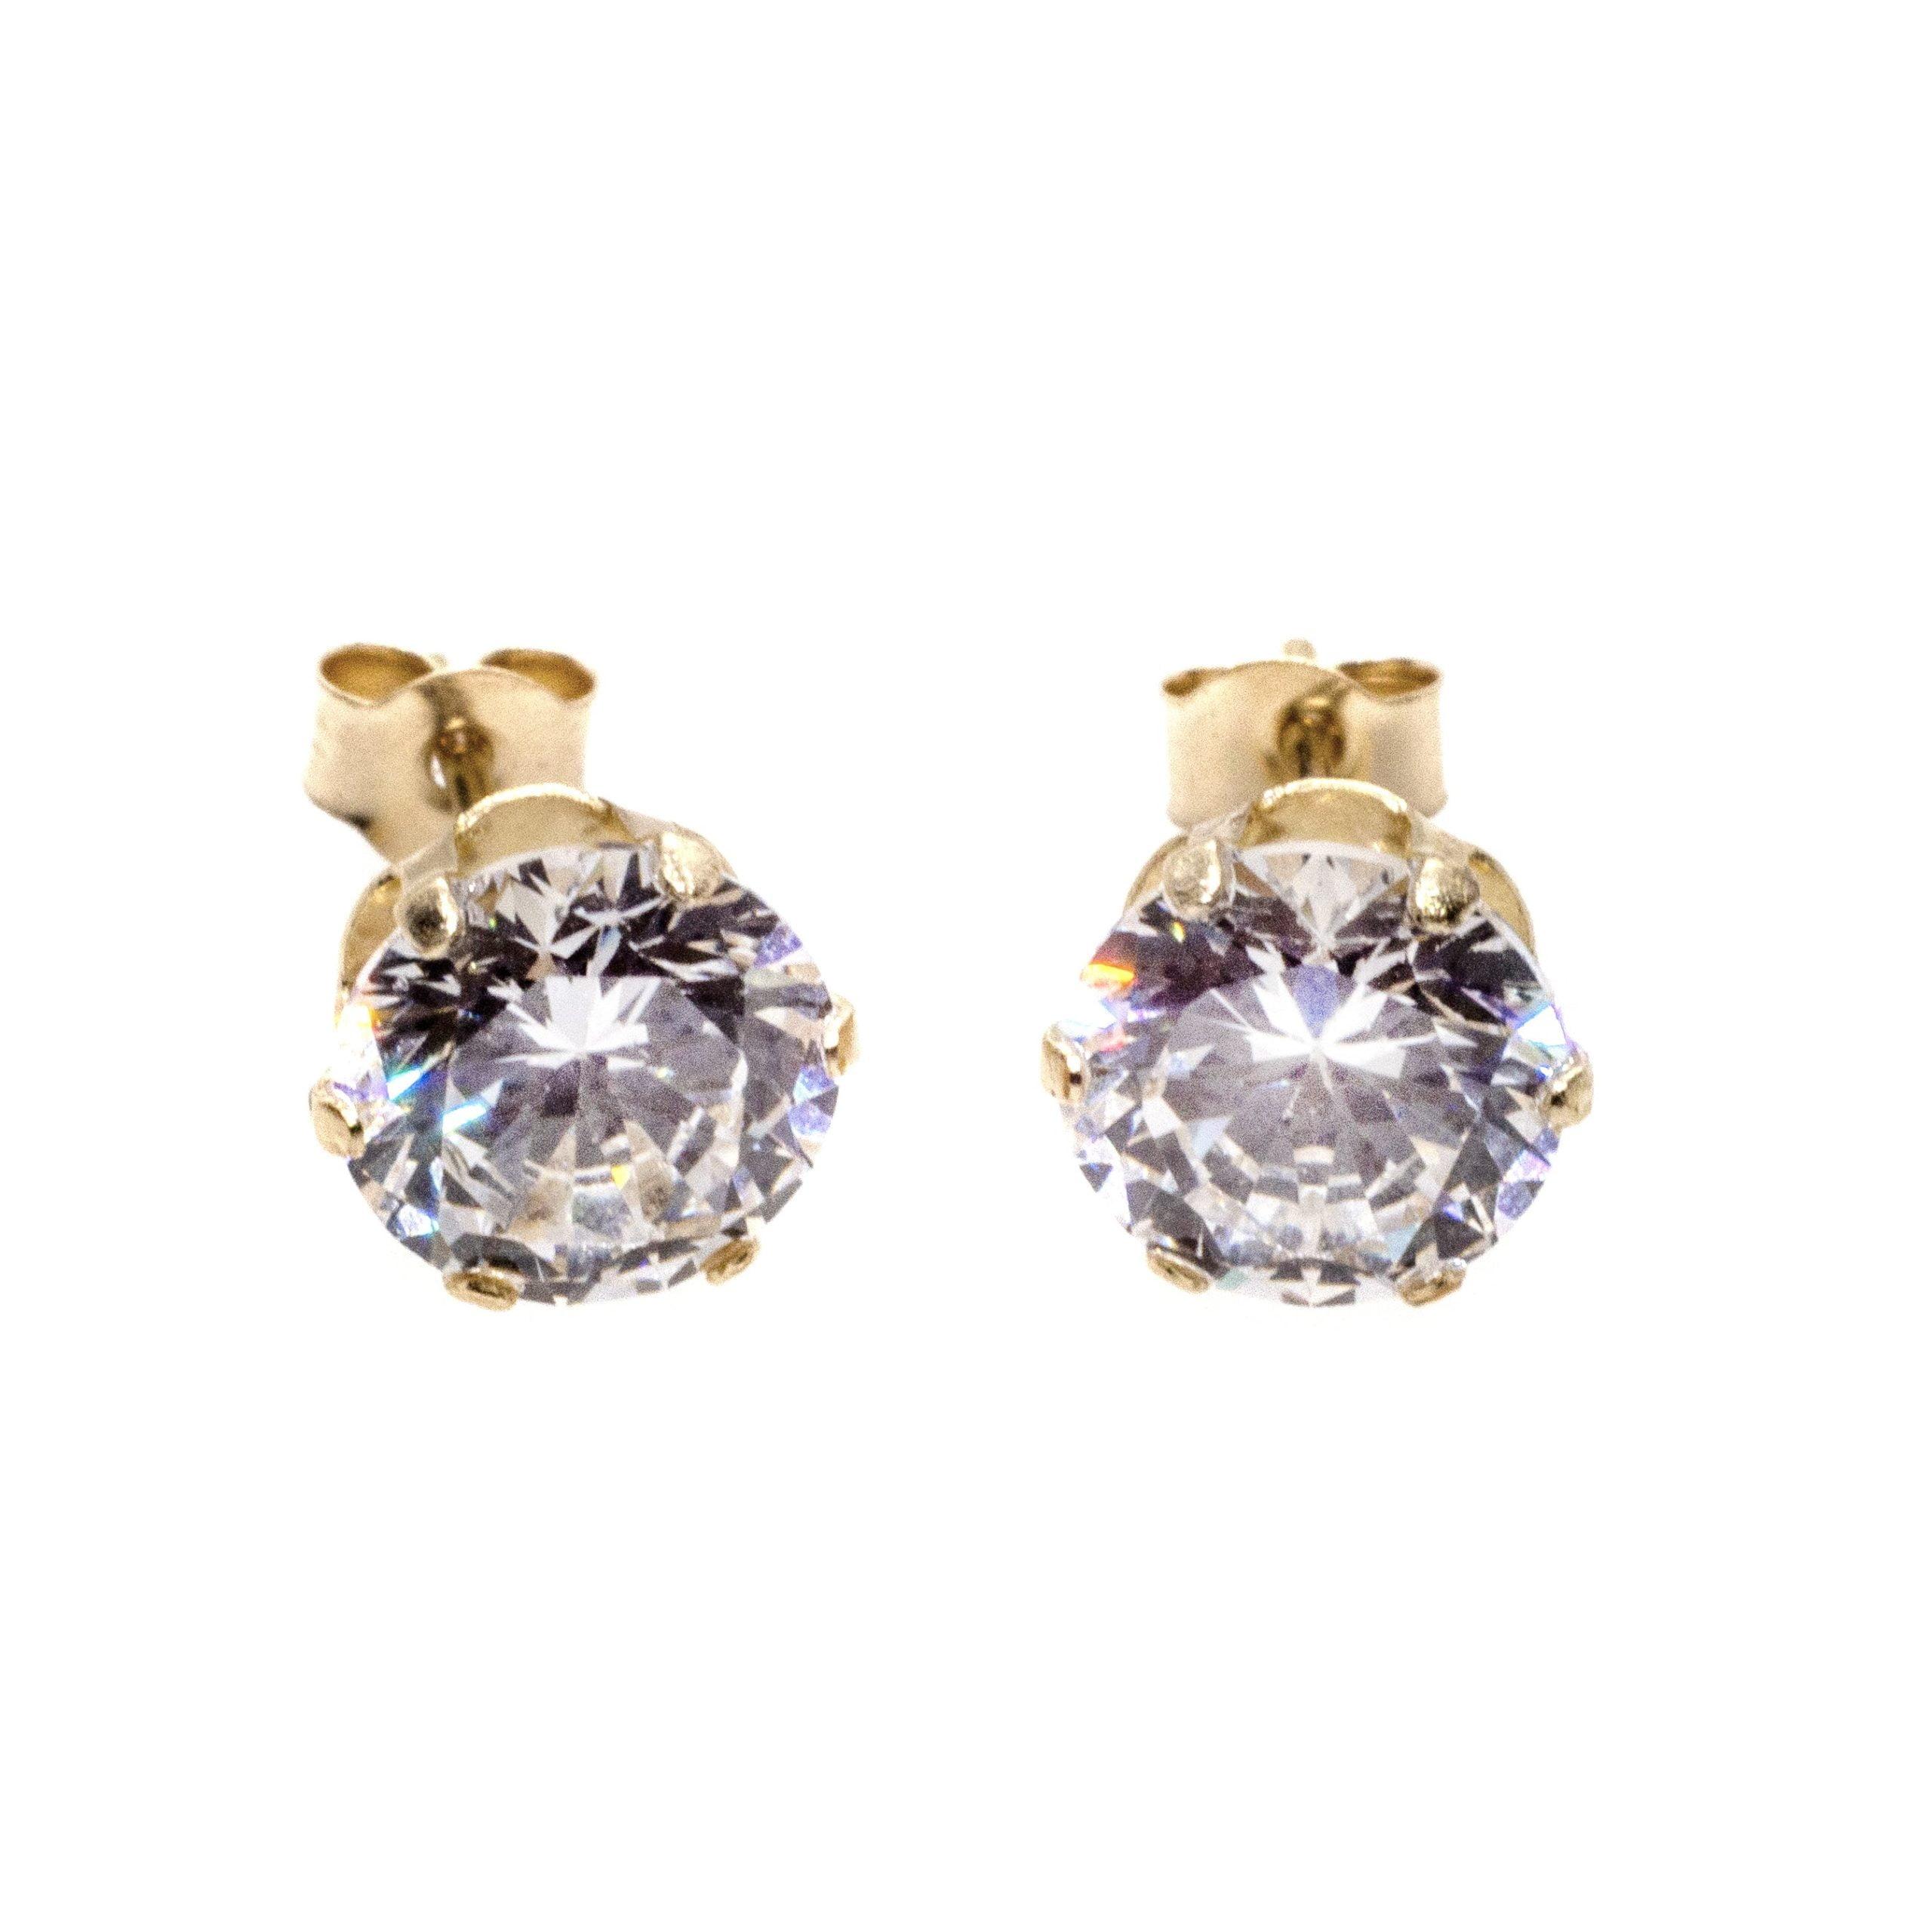 6mm CZ stud earrings 9ct yellow gold alt 4